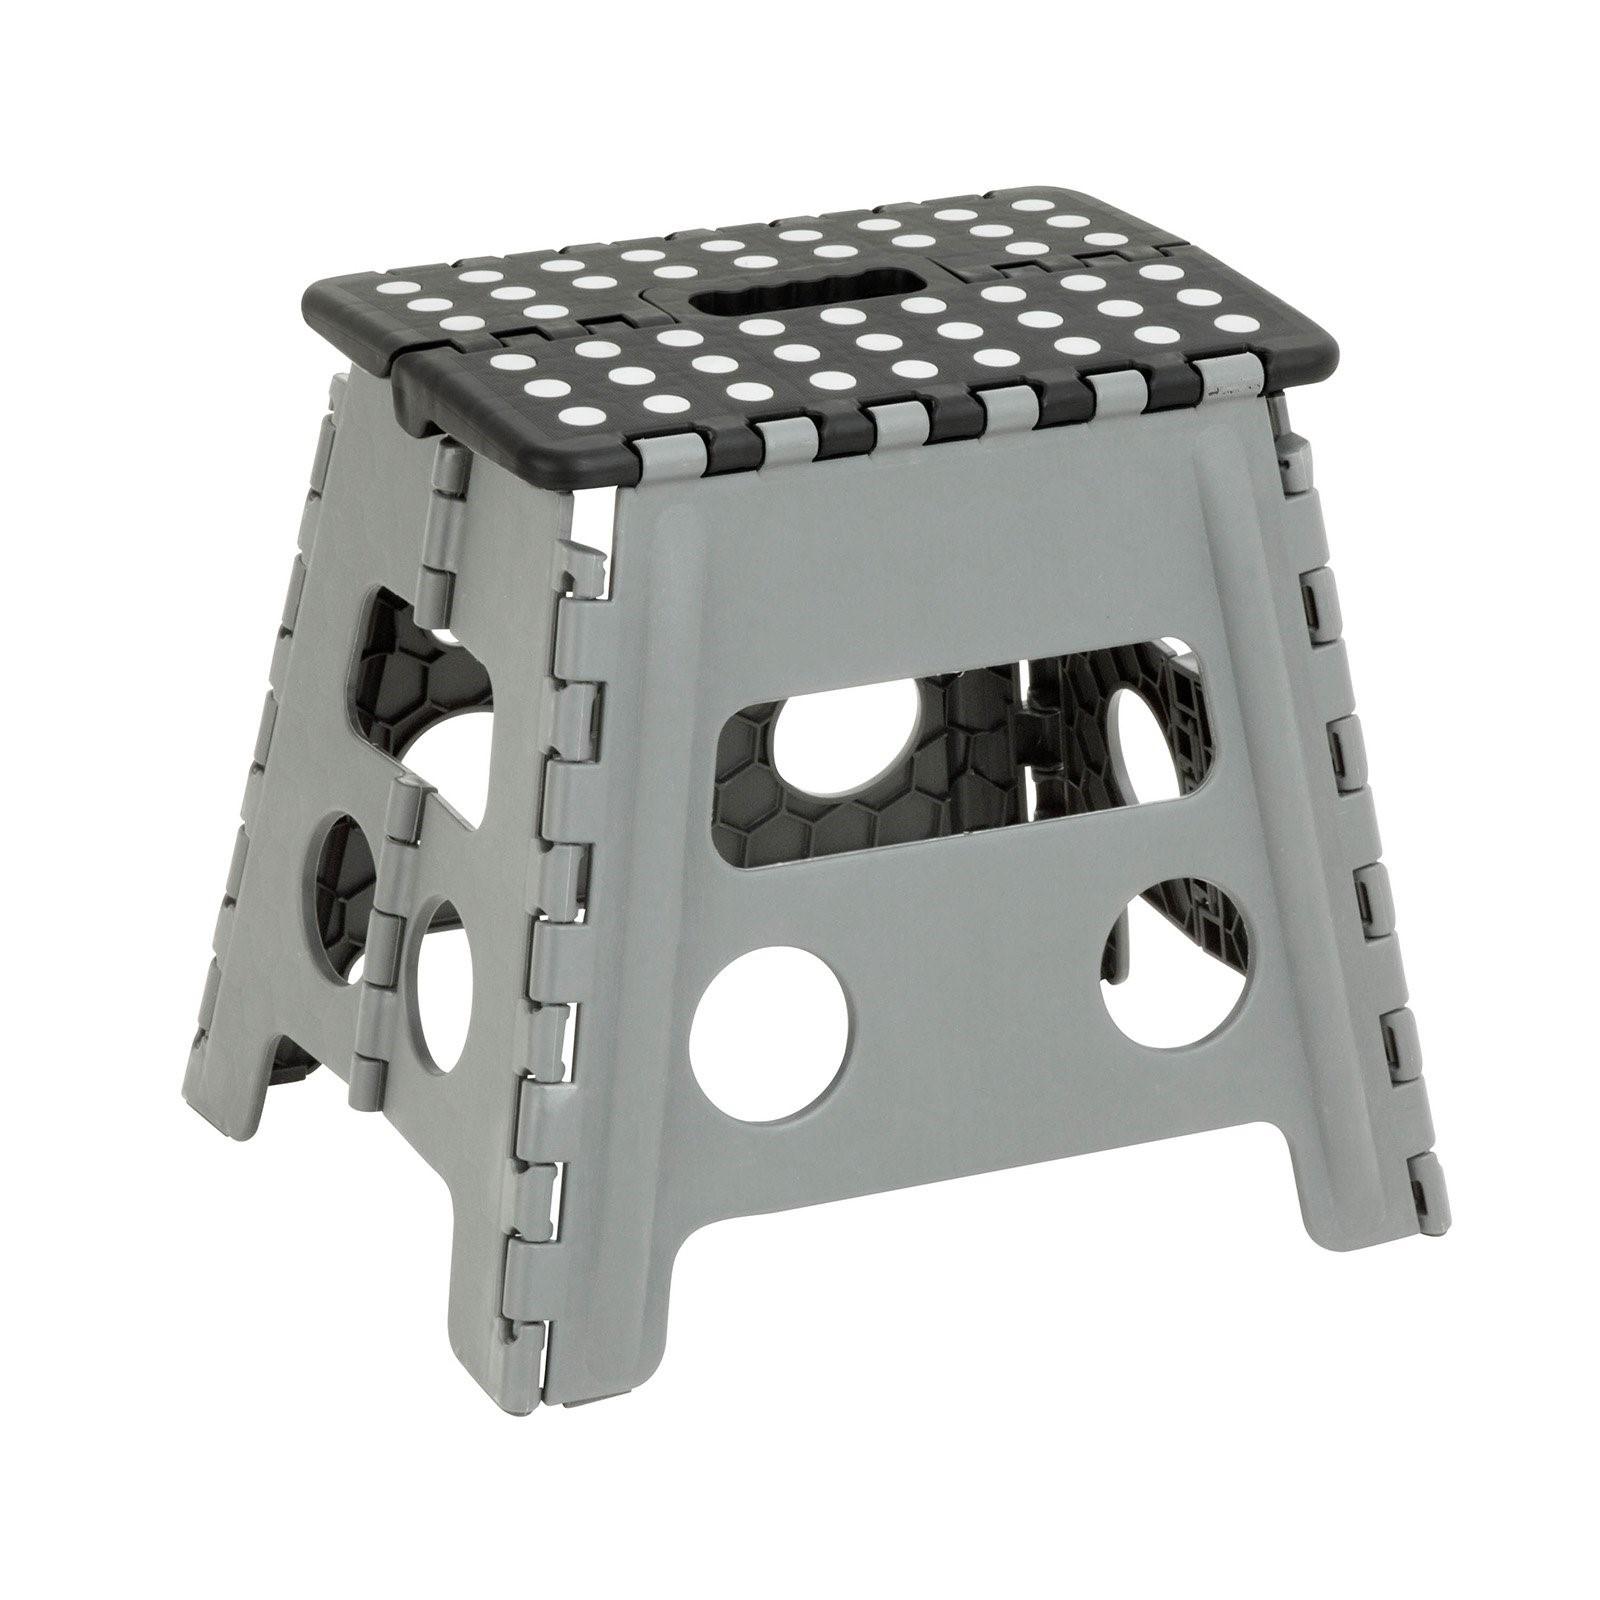 Superb Honey Can Do Folding Step Stool W Anti Slip Surface 9 99 Pabps2019 Chair Design Images Pabps2019Com